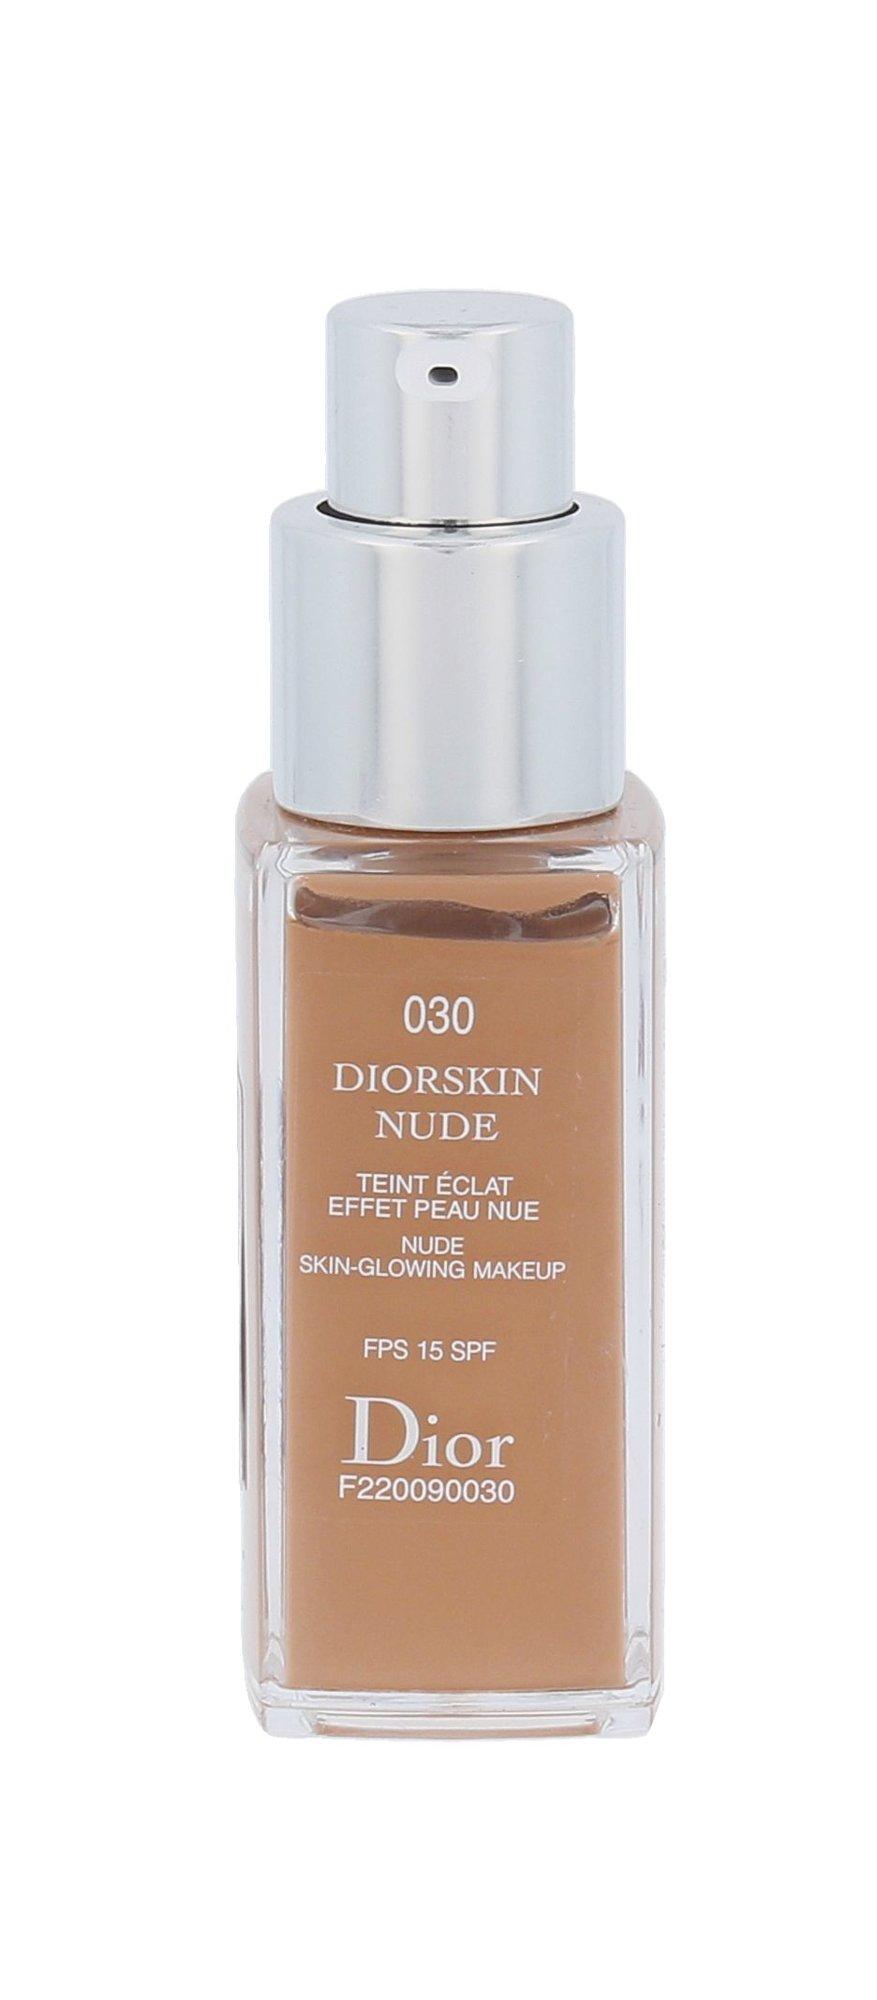 Christian Dior Diorskin Nude Cosmetic 20ml 030 Medium Beige